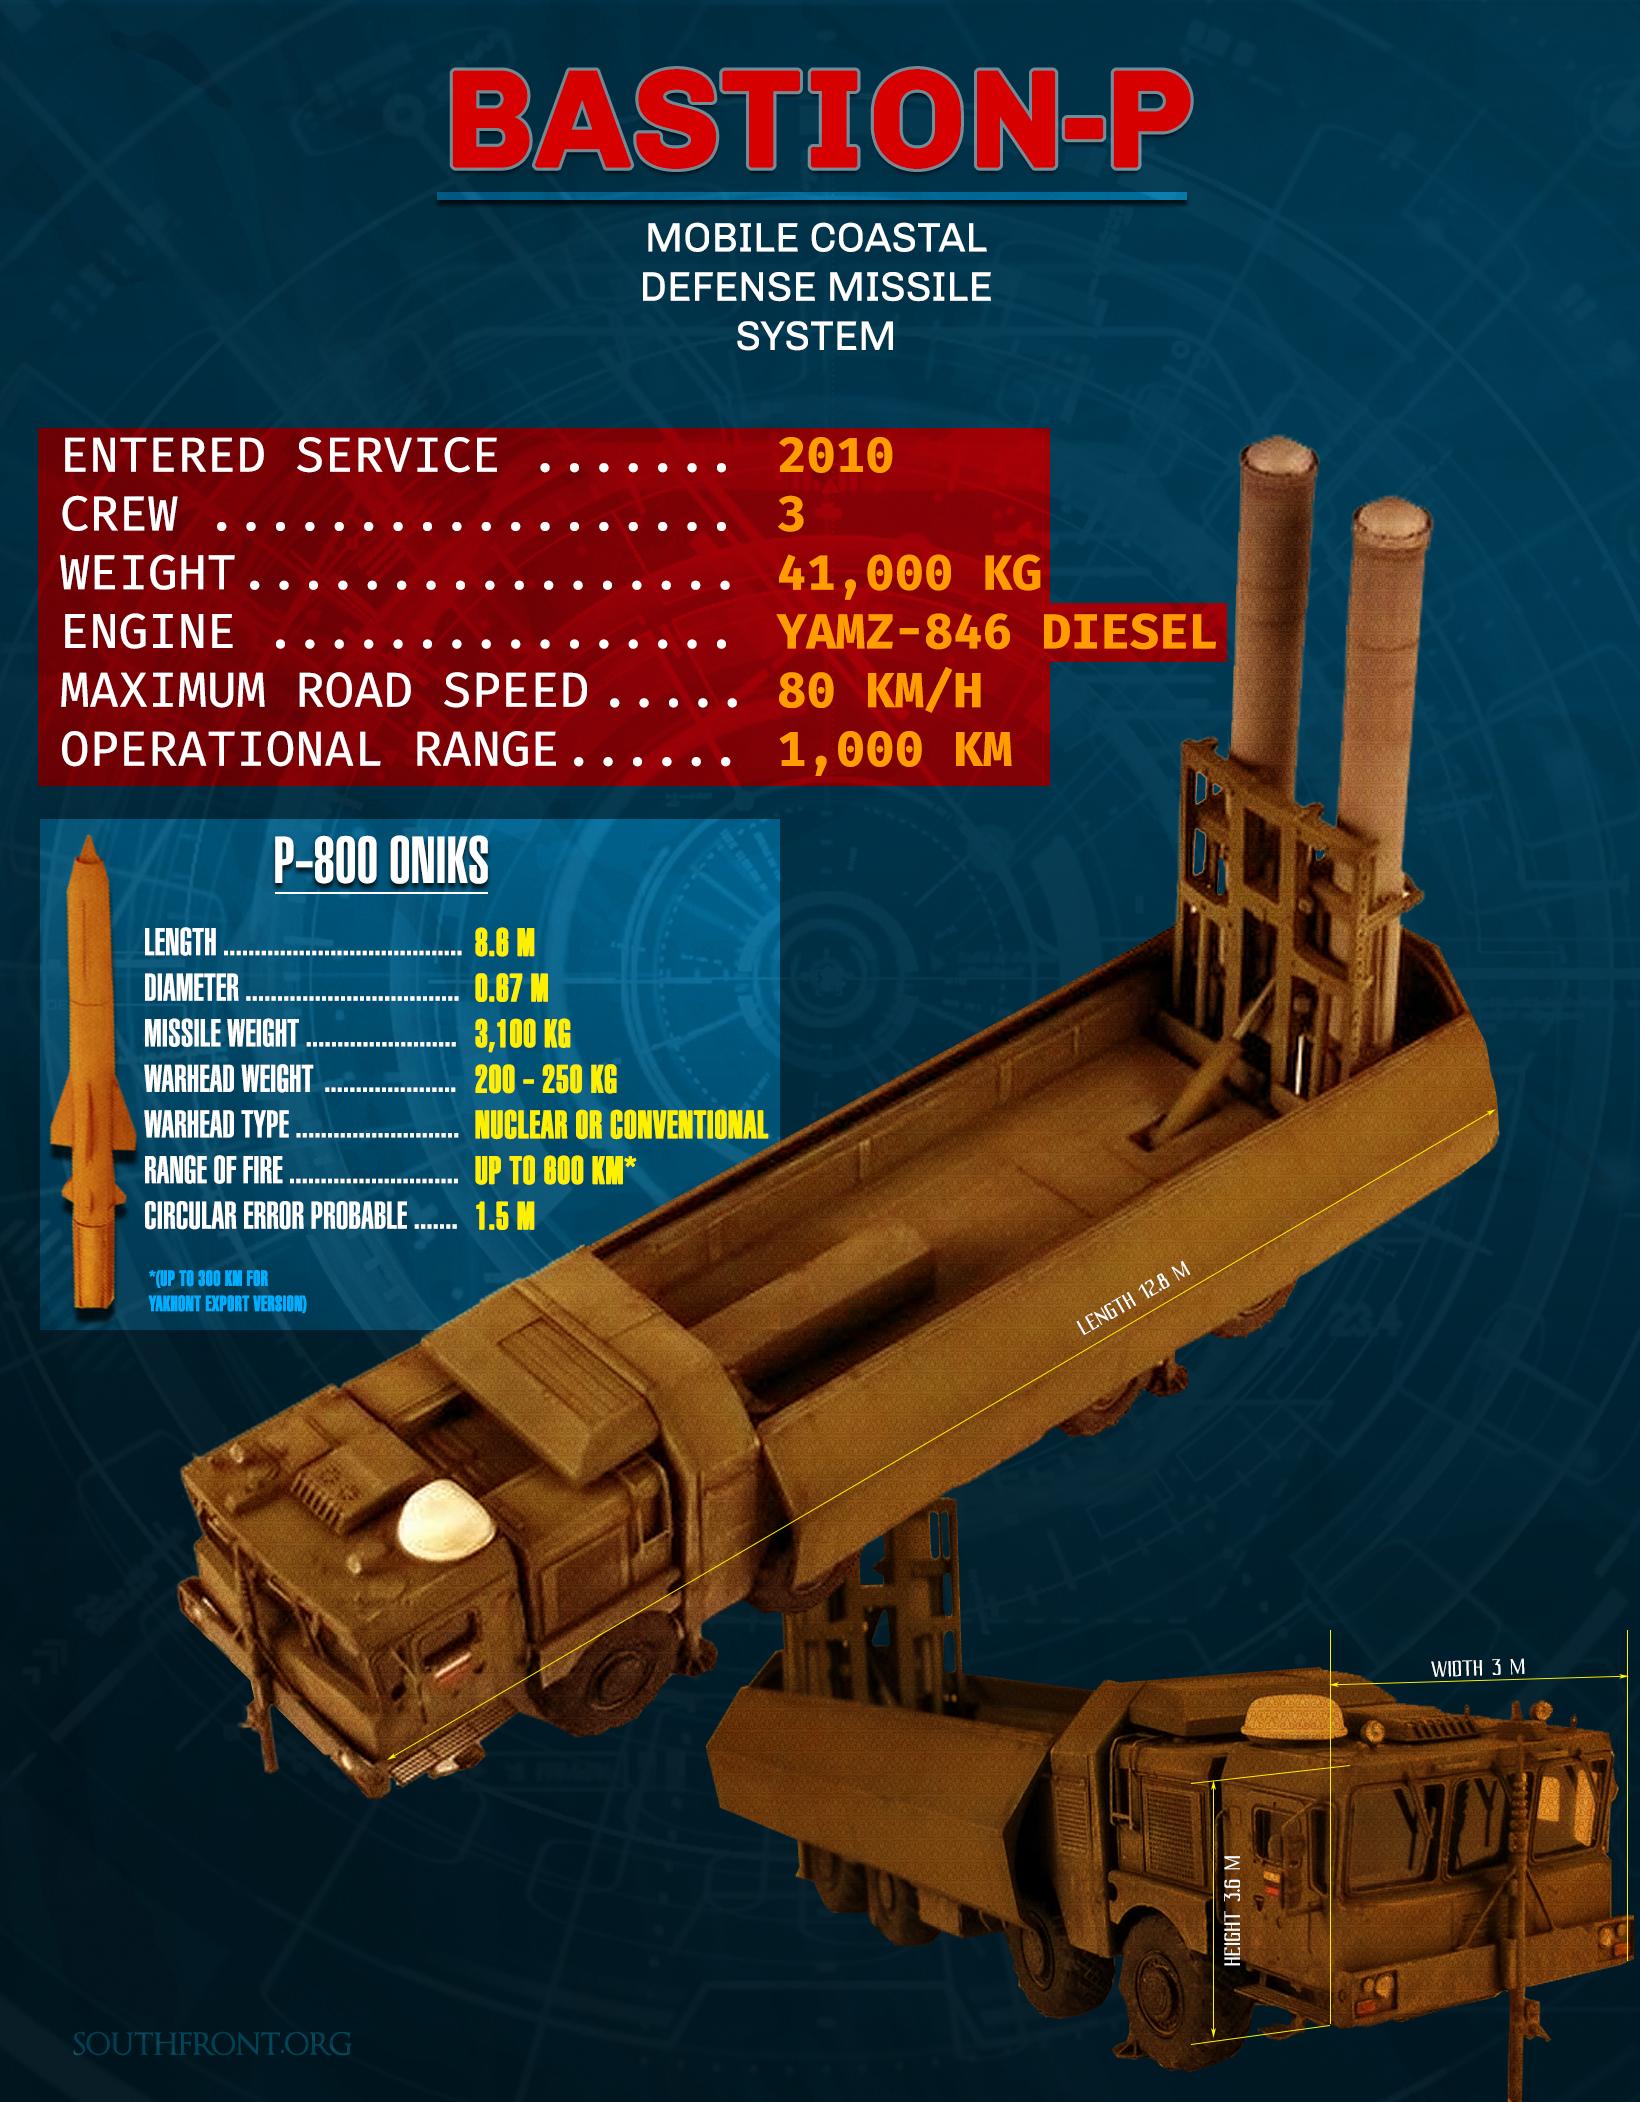 Bastion-P Coastal Defense Missile System (Infographics)